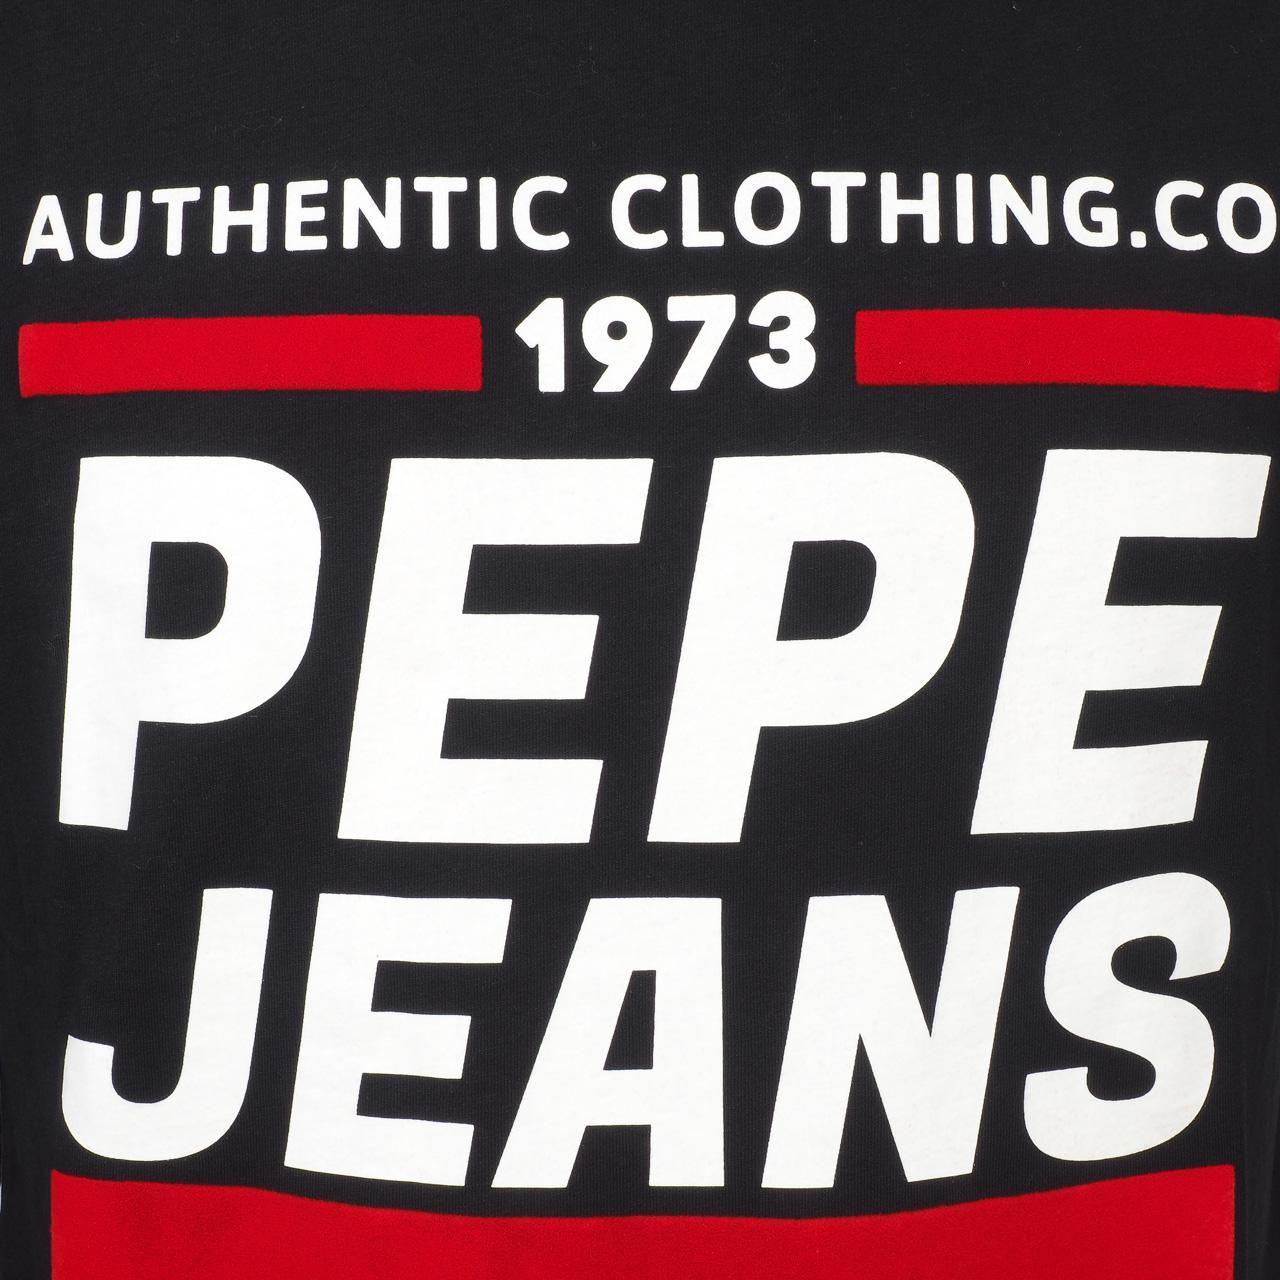 Tee-shirt-manches-longues-Pepe-jeans-Blake-black-ml-tee-jr-Noir-14082-Neuf miniature 2